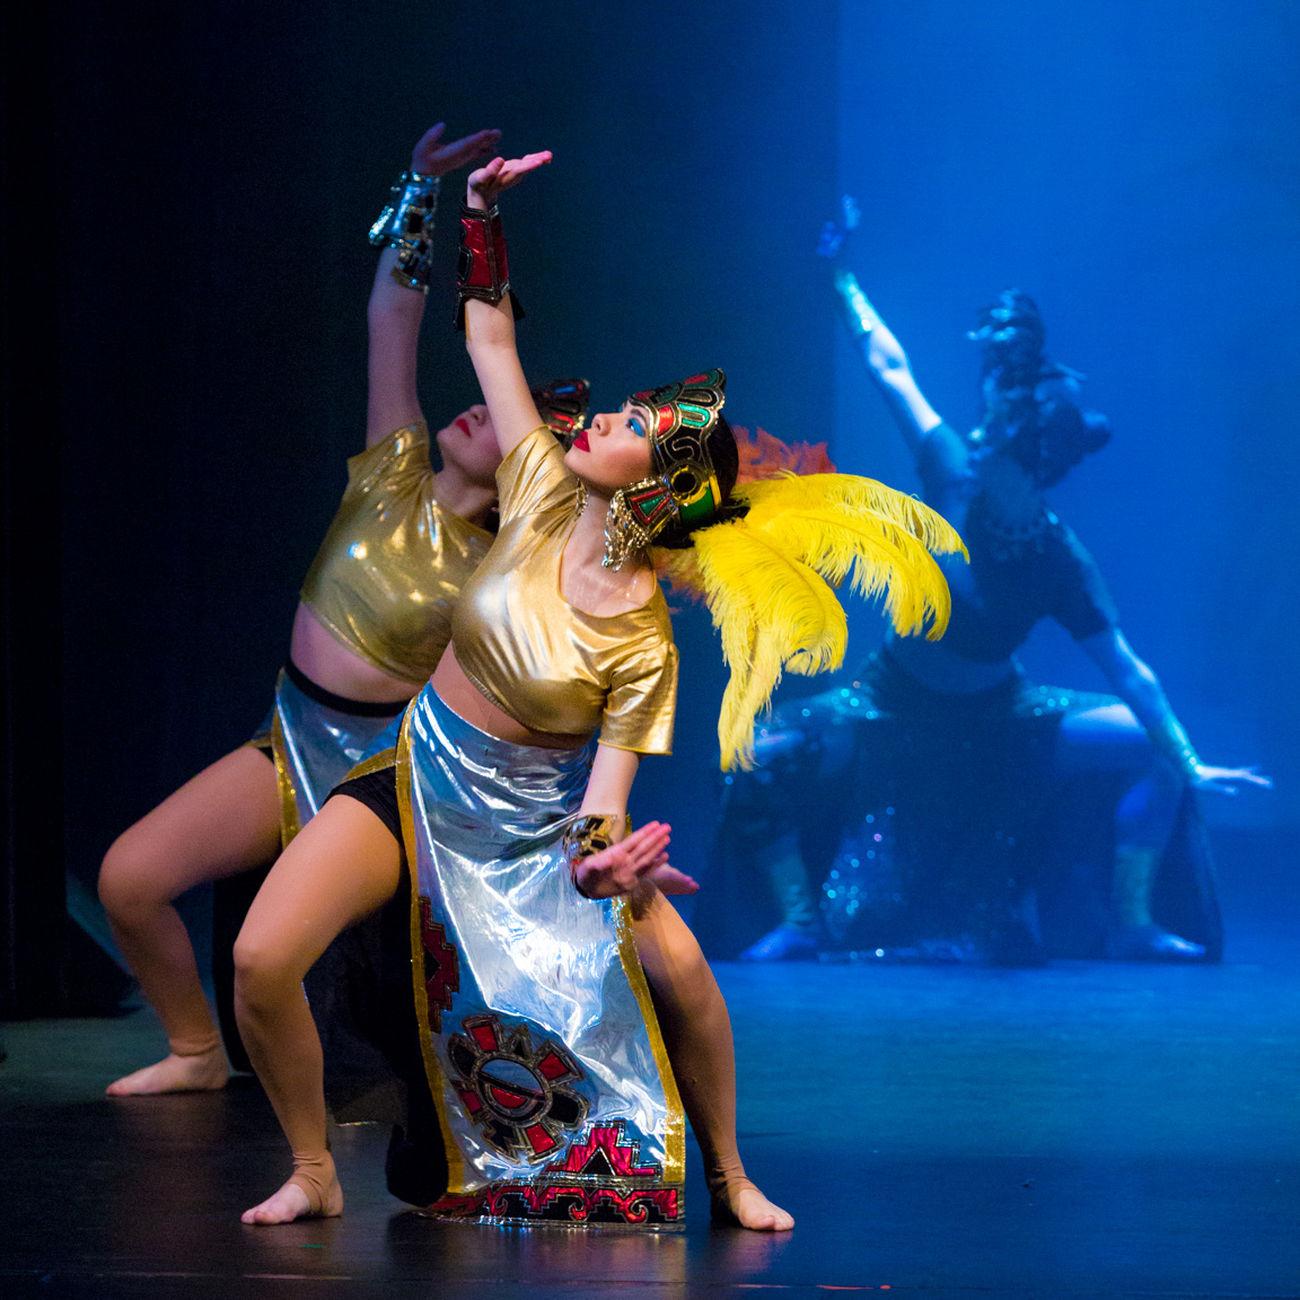 Folklorico Folk Dance Aztec Aztlan Aztlan Culture Stagephotography Stage Photography Lowlight Lowlightphotography Indian Native Dancer Native Dress Native Dance Hispanic